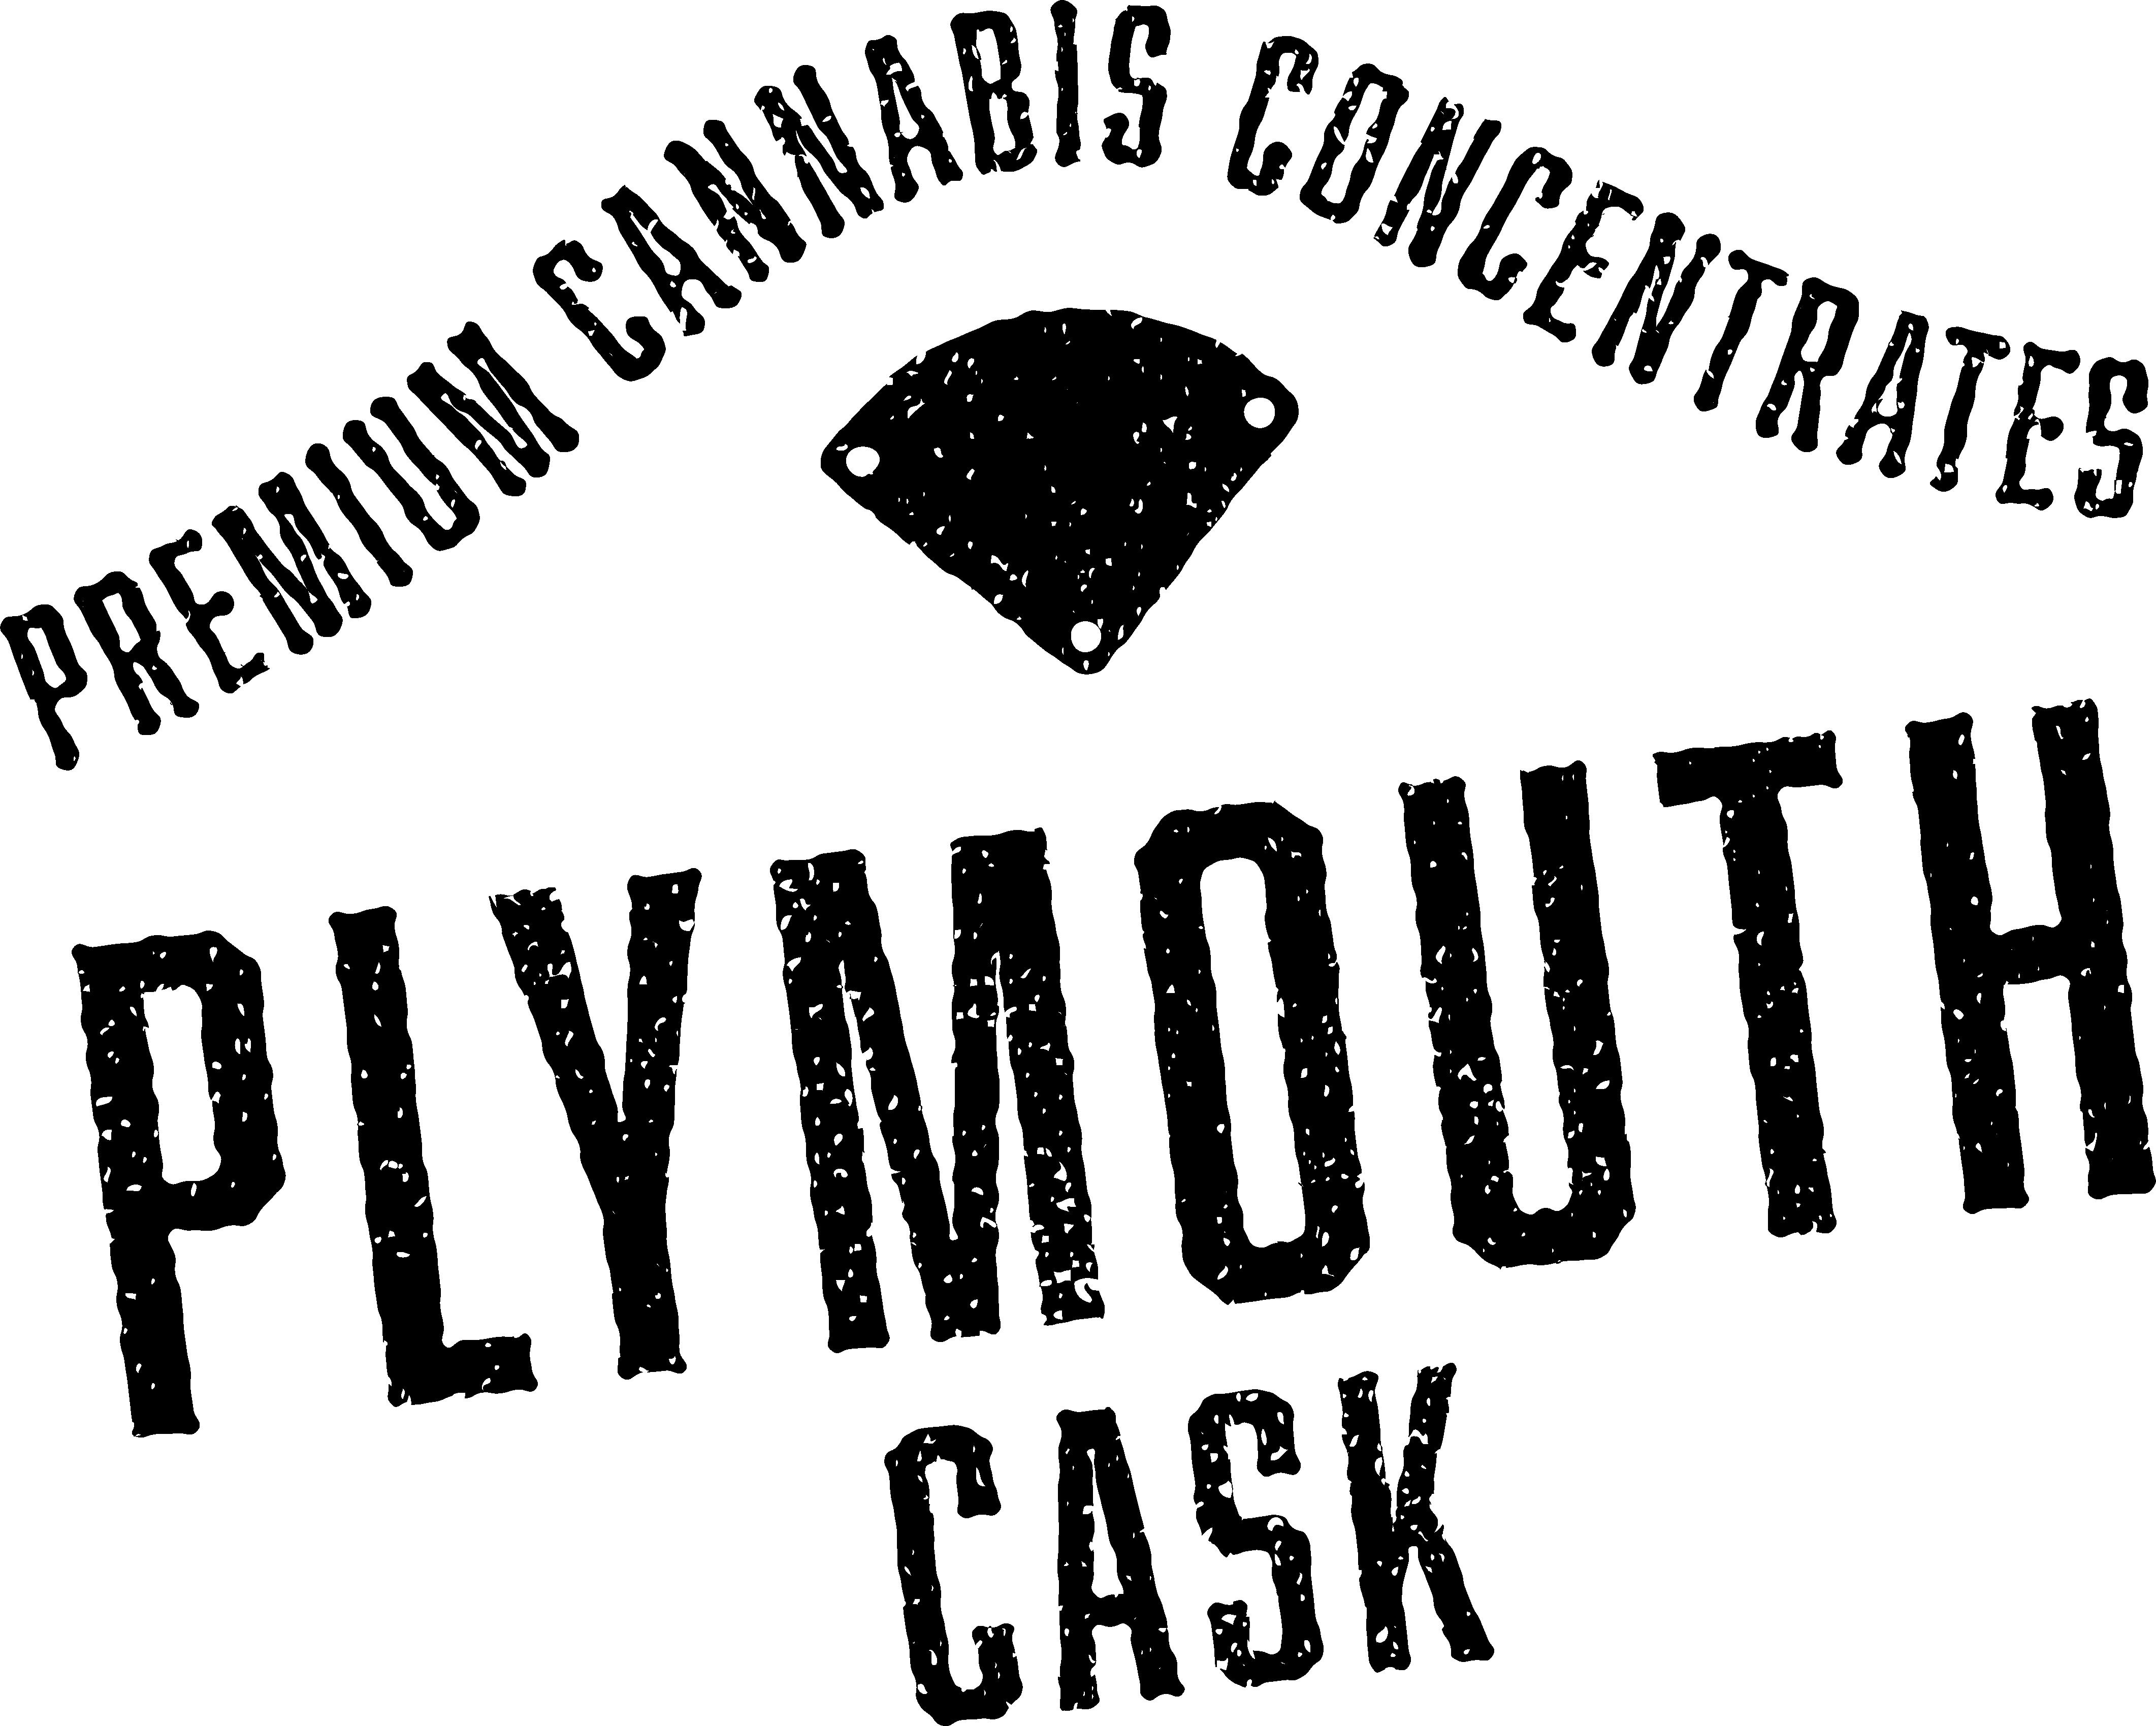 Plymouth Cask logo